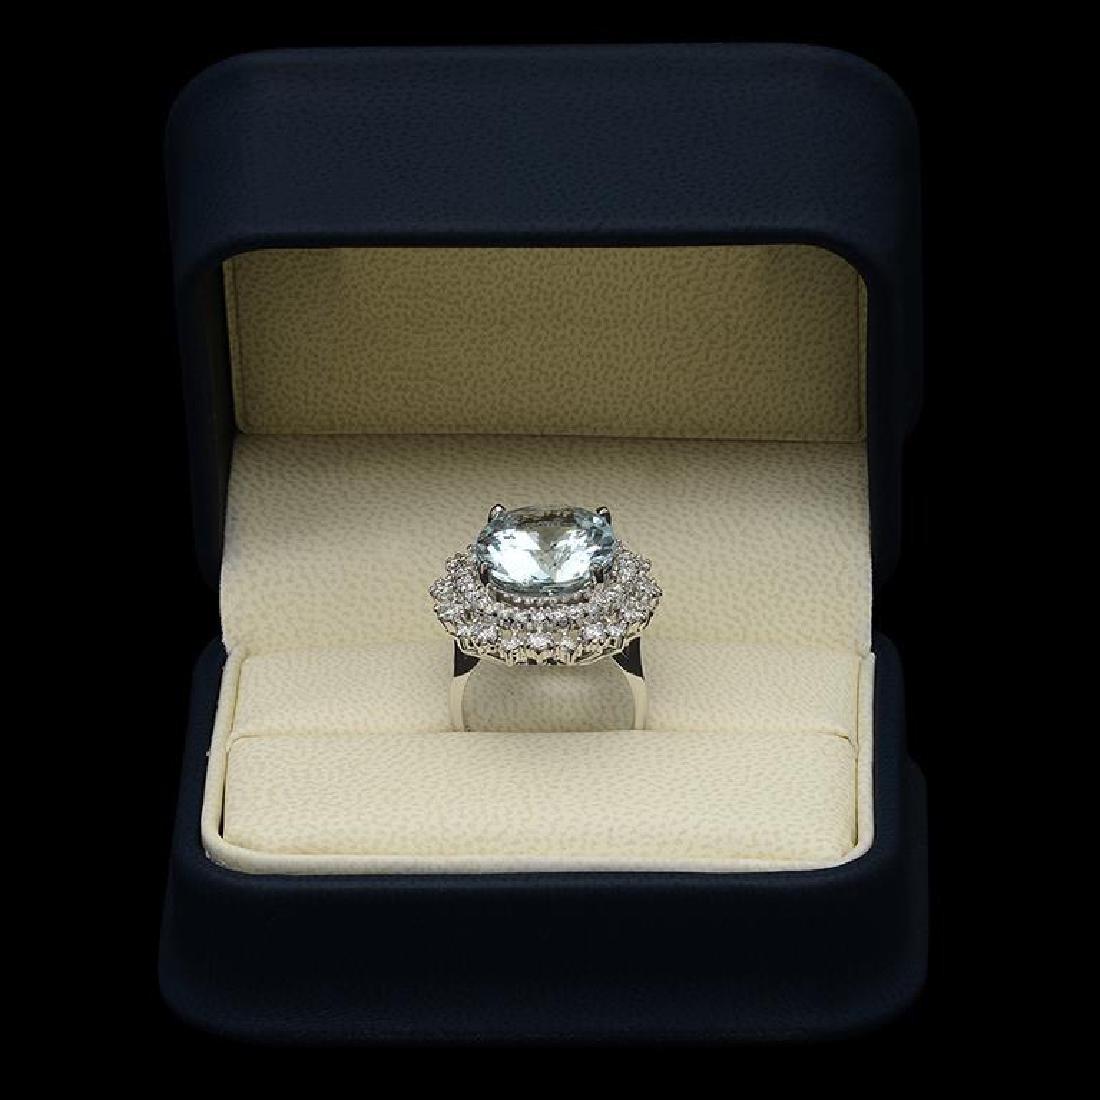 14K Gold 12.15ct Aquamarine 1.75ct Diamond Ring - 3